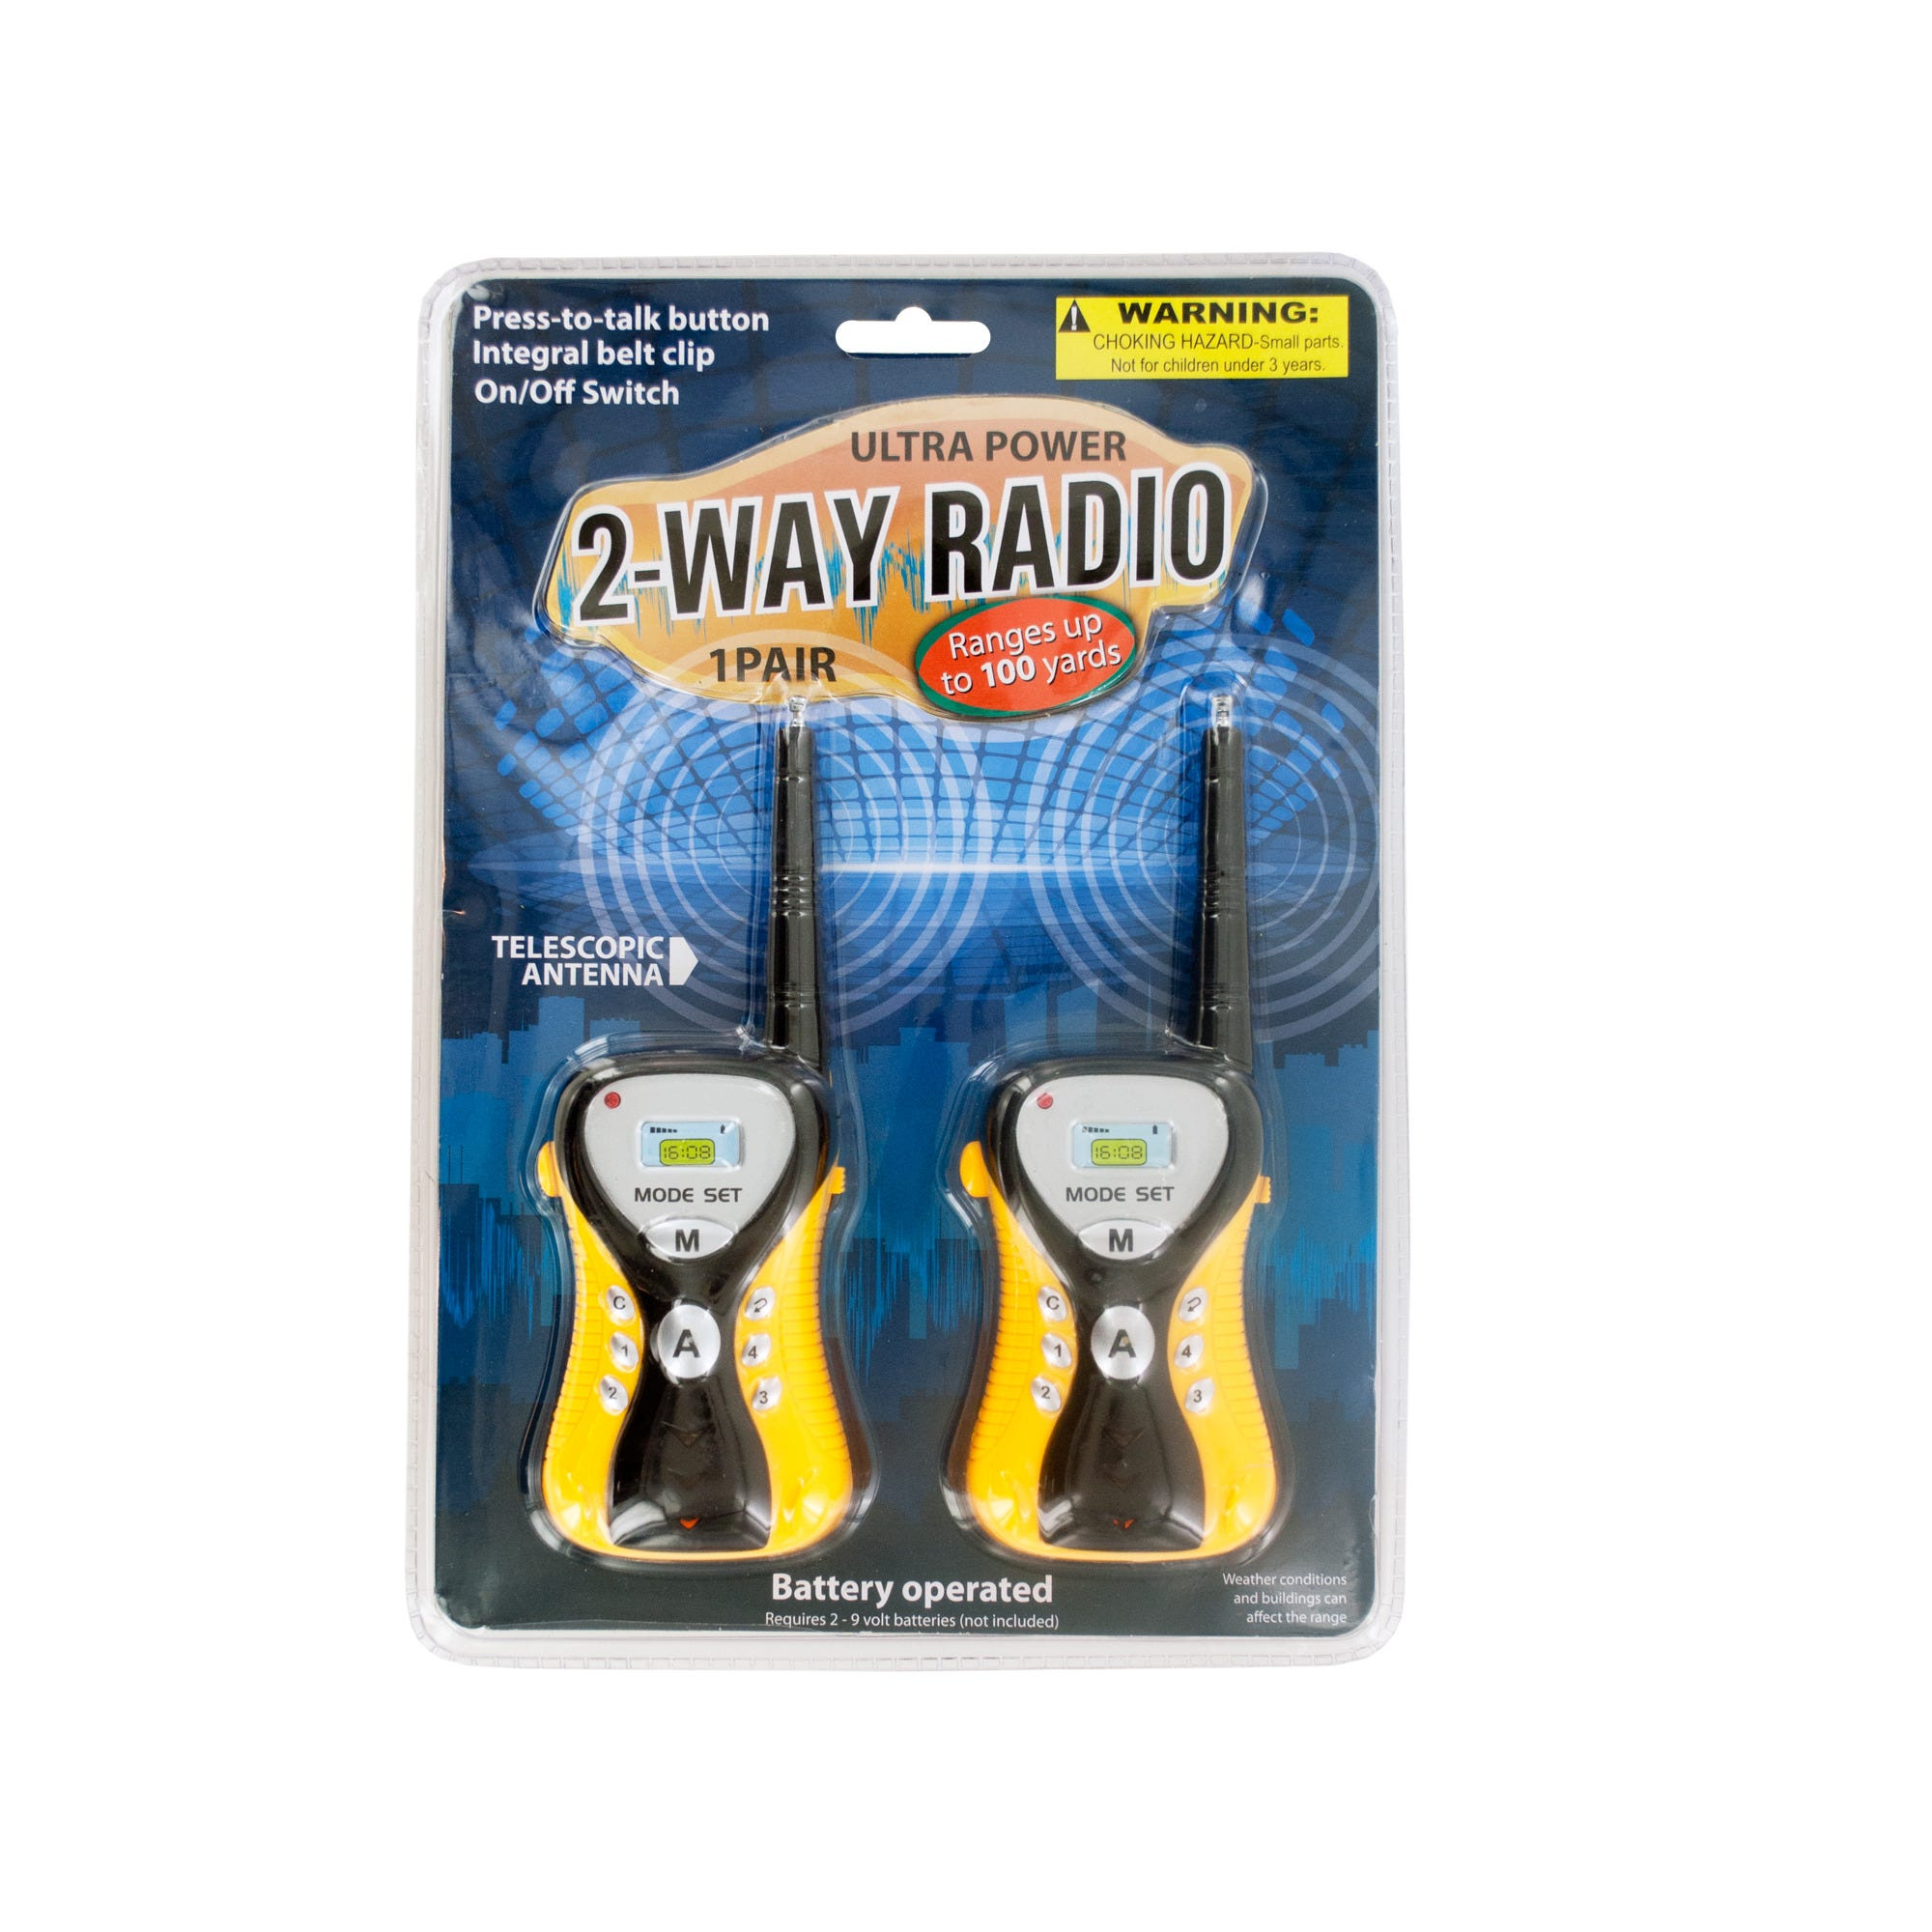 Ultra Power 2-Way Radio Set